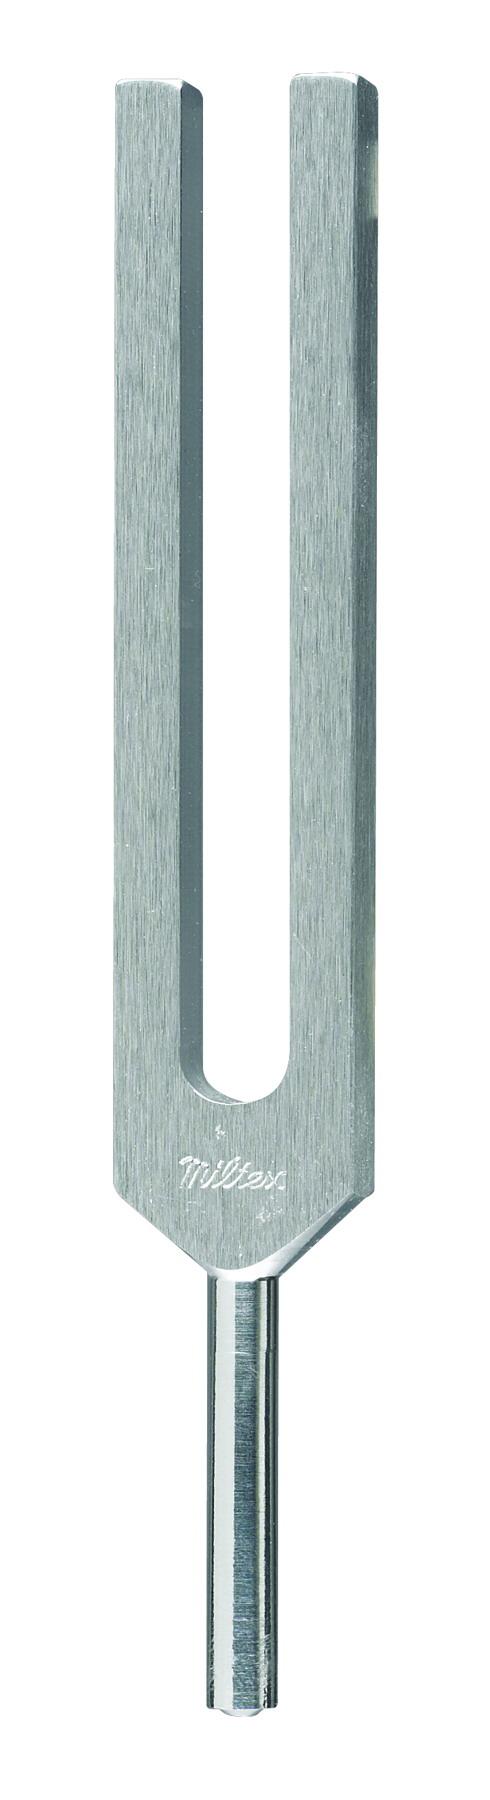 miltex-tuning-forks-aluminum-alloy-c-512-vibrations-19-106-miltex.jpg